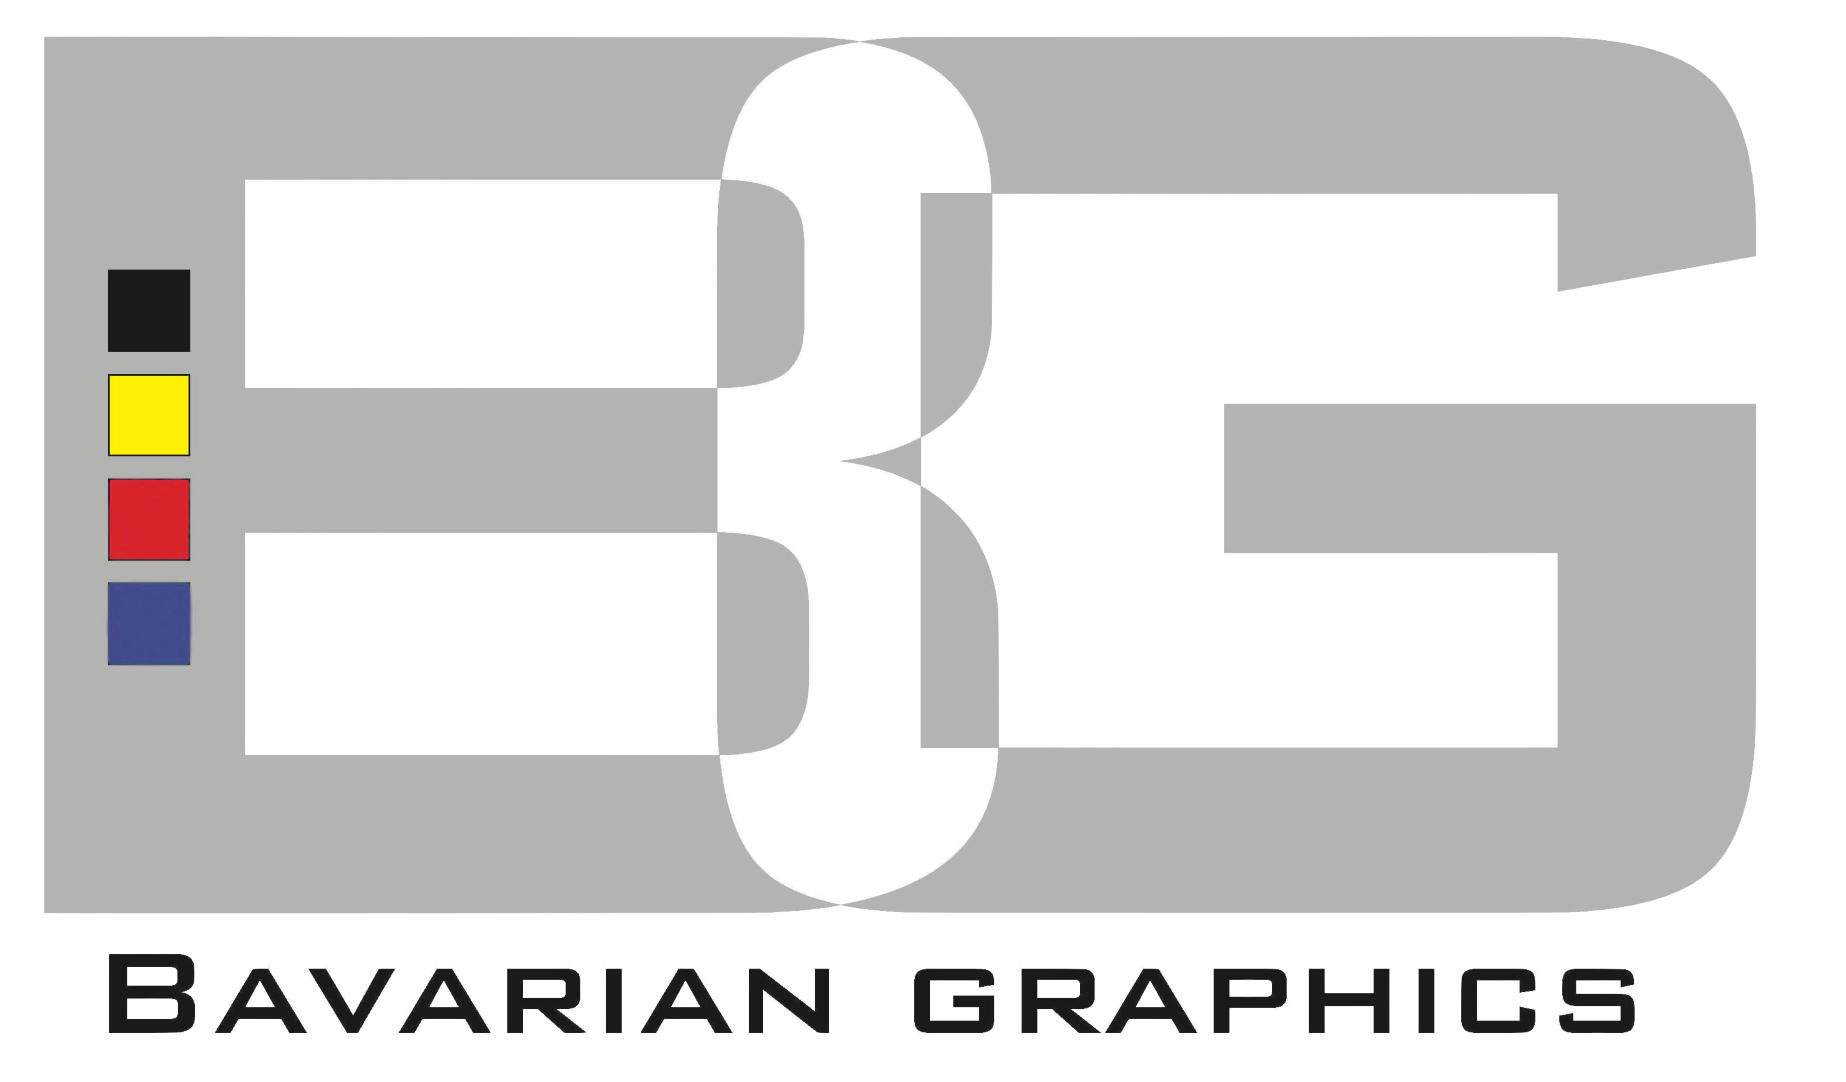 Bavarian graphics